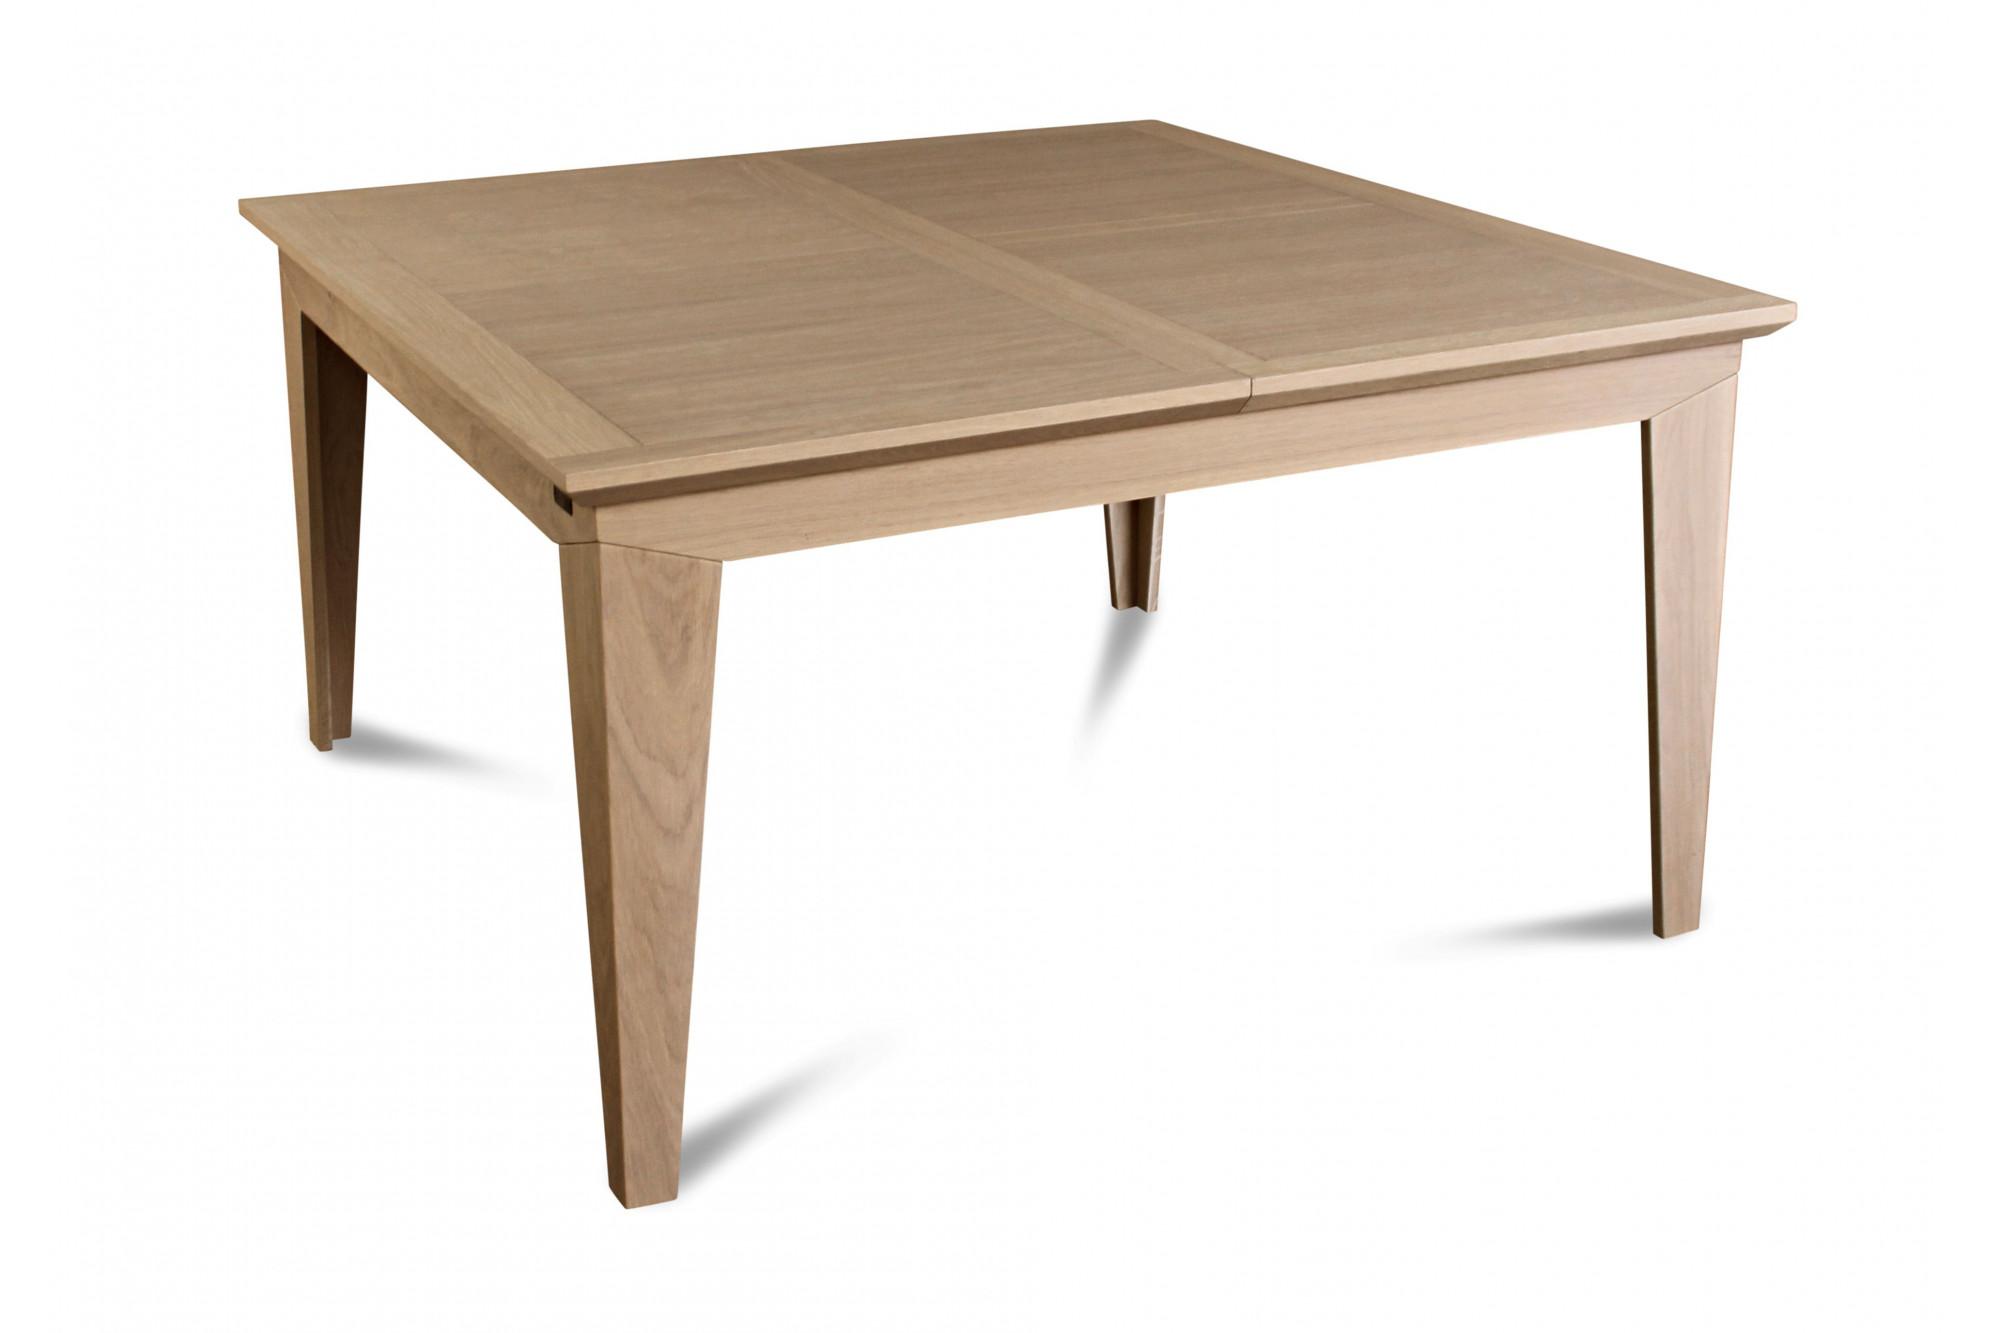 Table Salle A Manger Carré Avec Rallonge table carrée fabric - meuble d'occasion - hellin